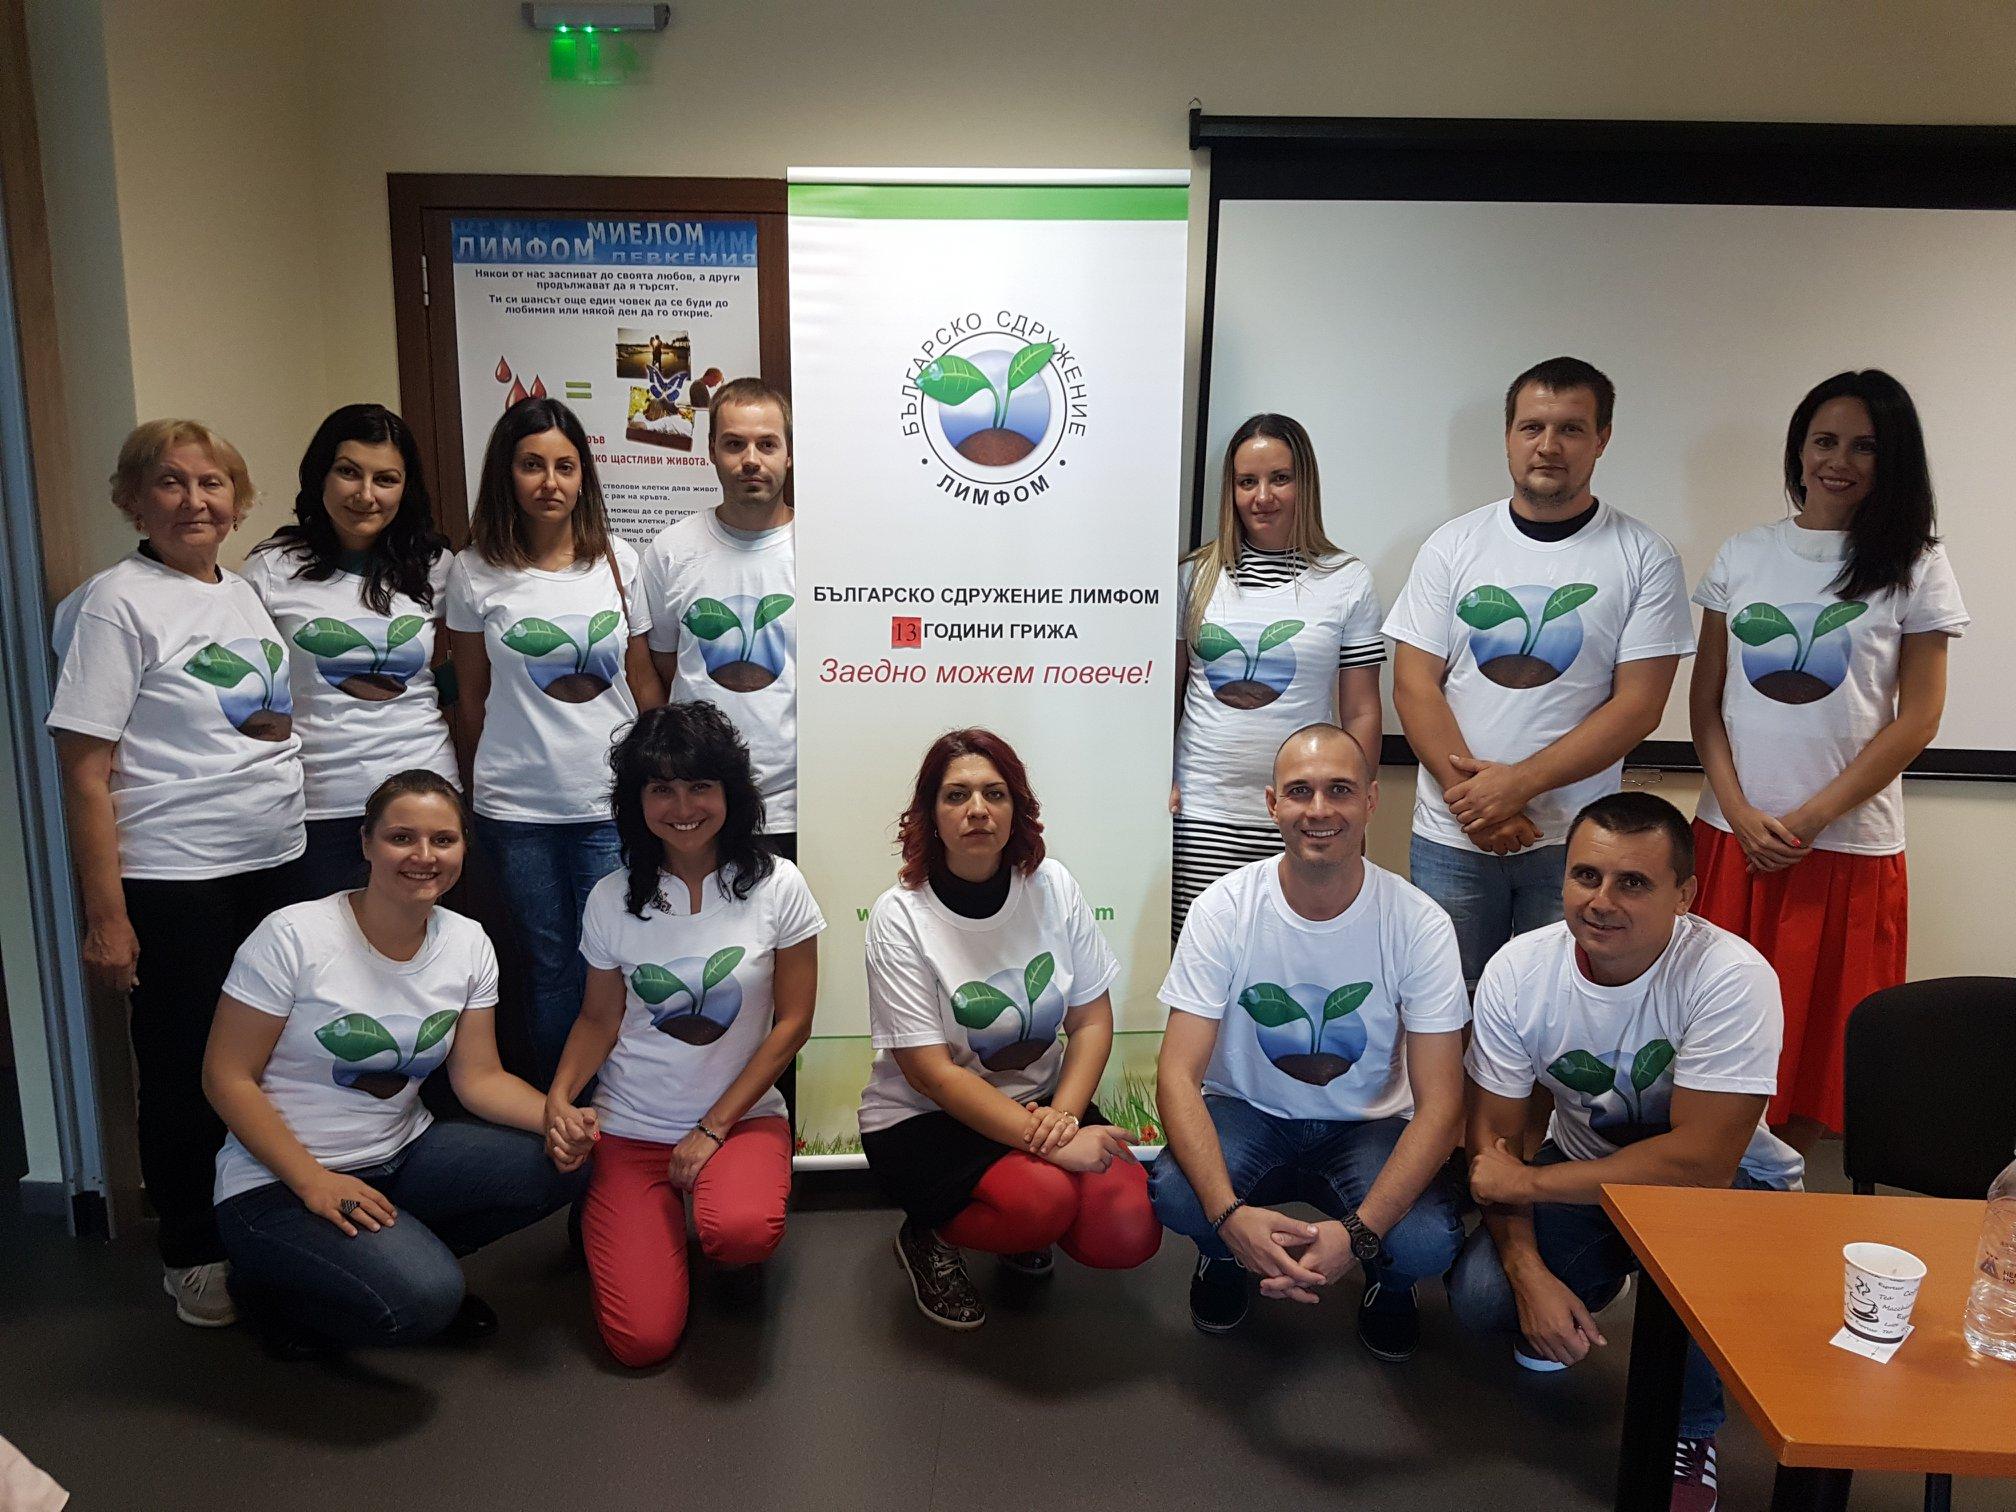 Българско Сдружение Лимфом и приятели